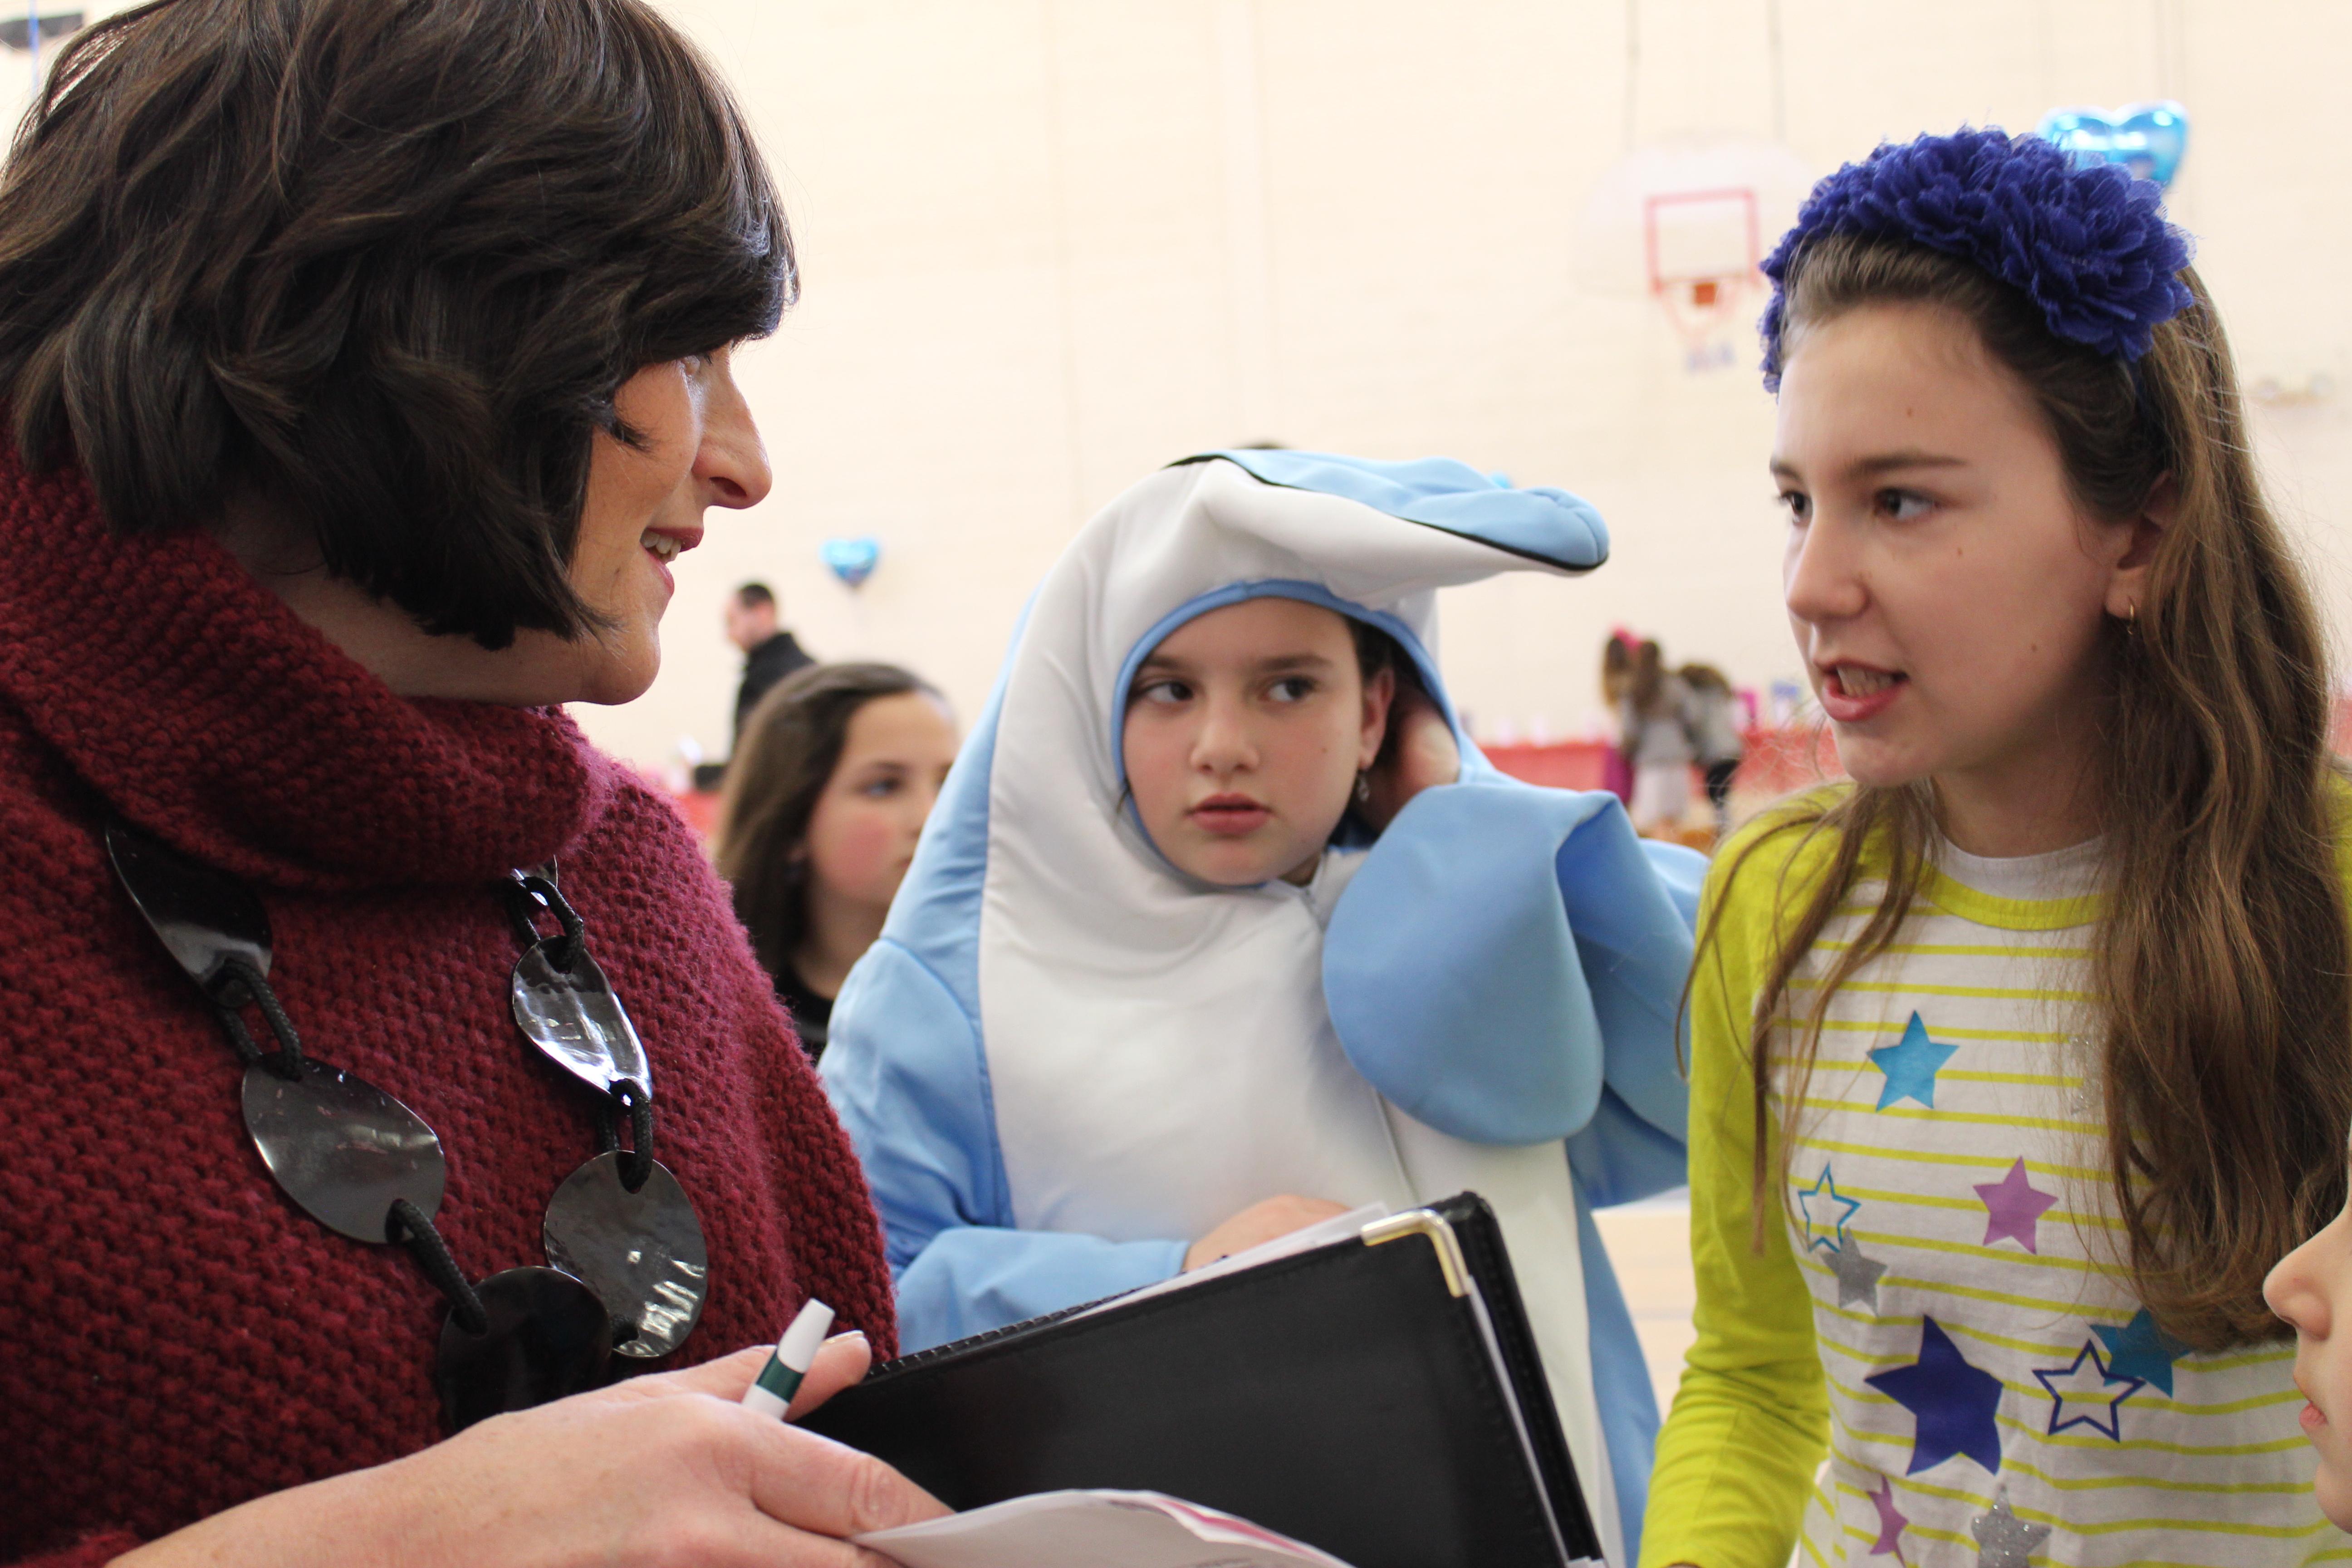 Mrs. BRaun with girls